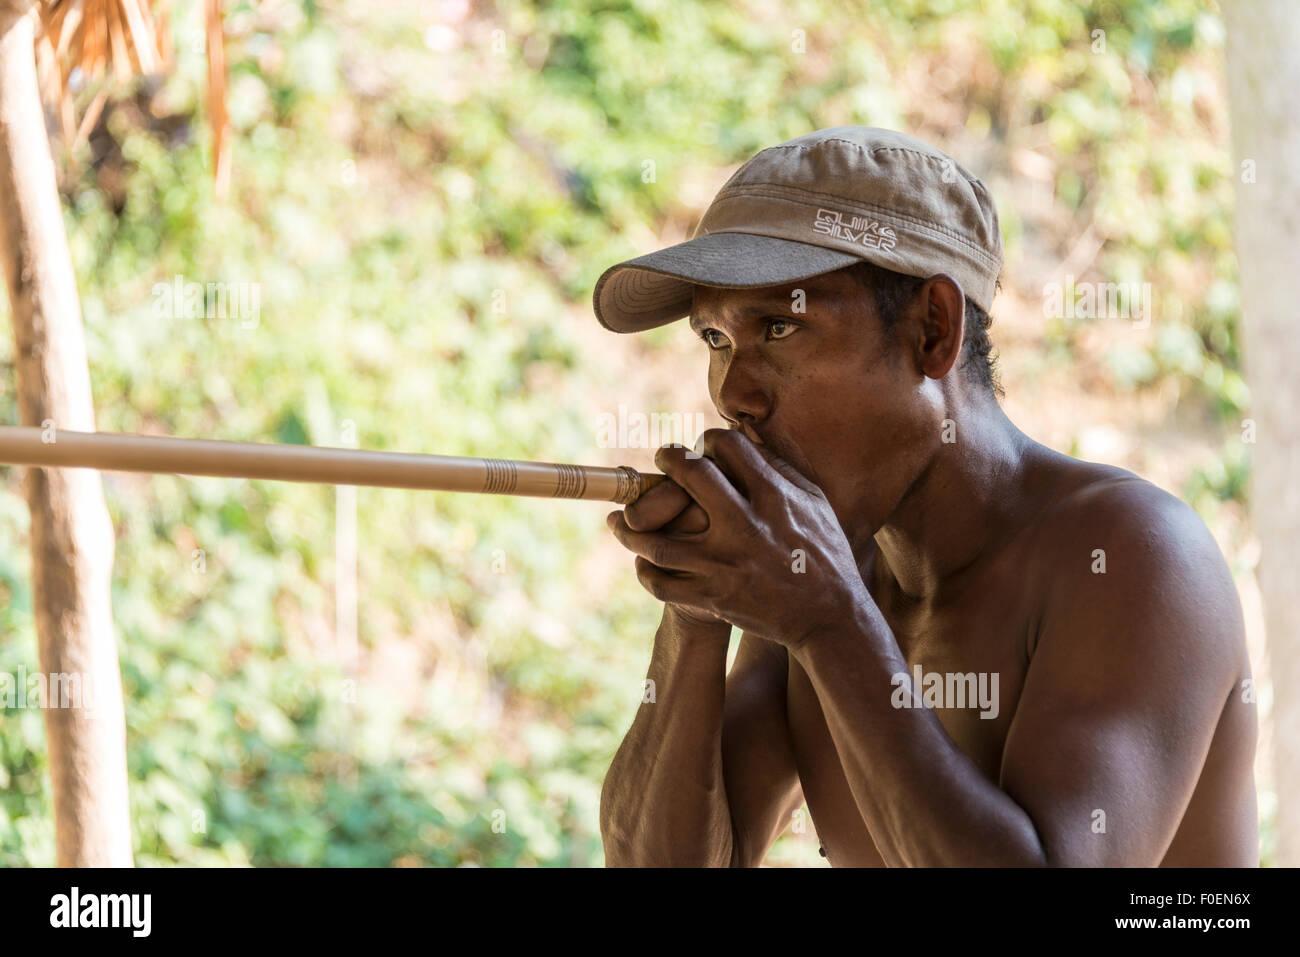 Orang Asli native Mann schießen eine Blasrohr, Taman Negara Malaysia Stockbild